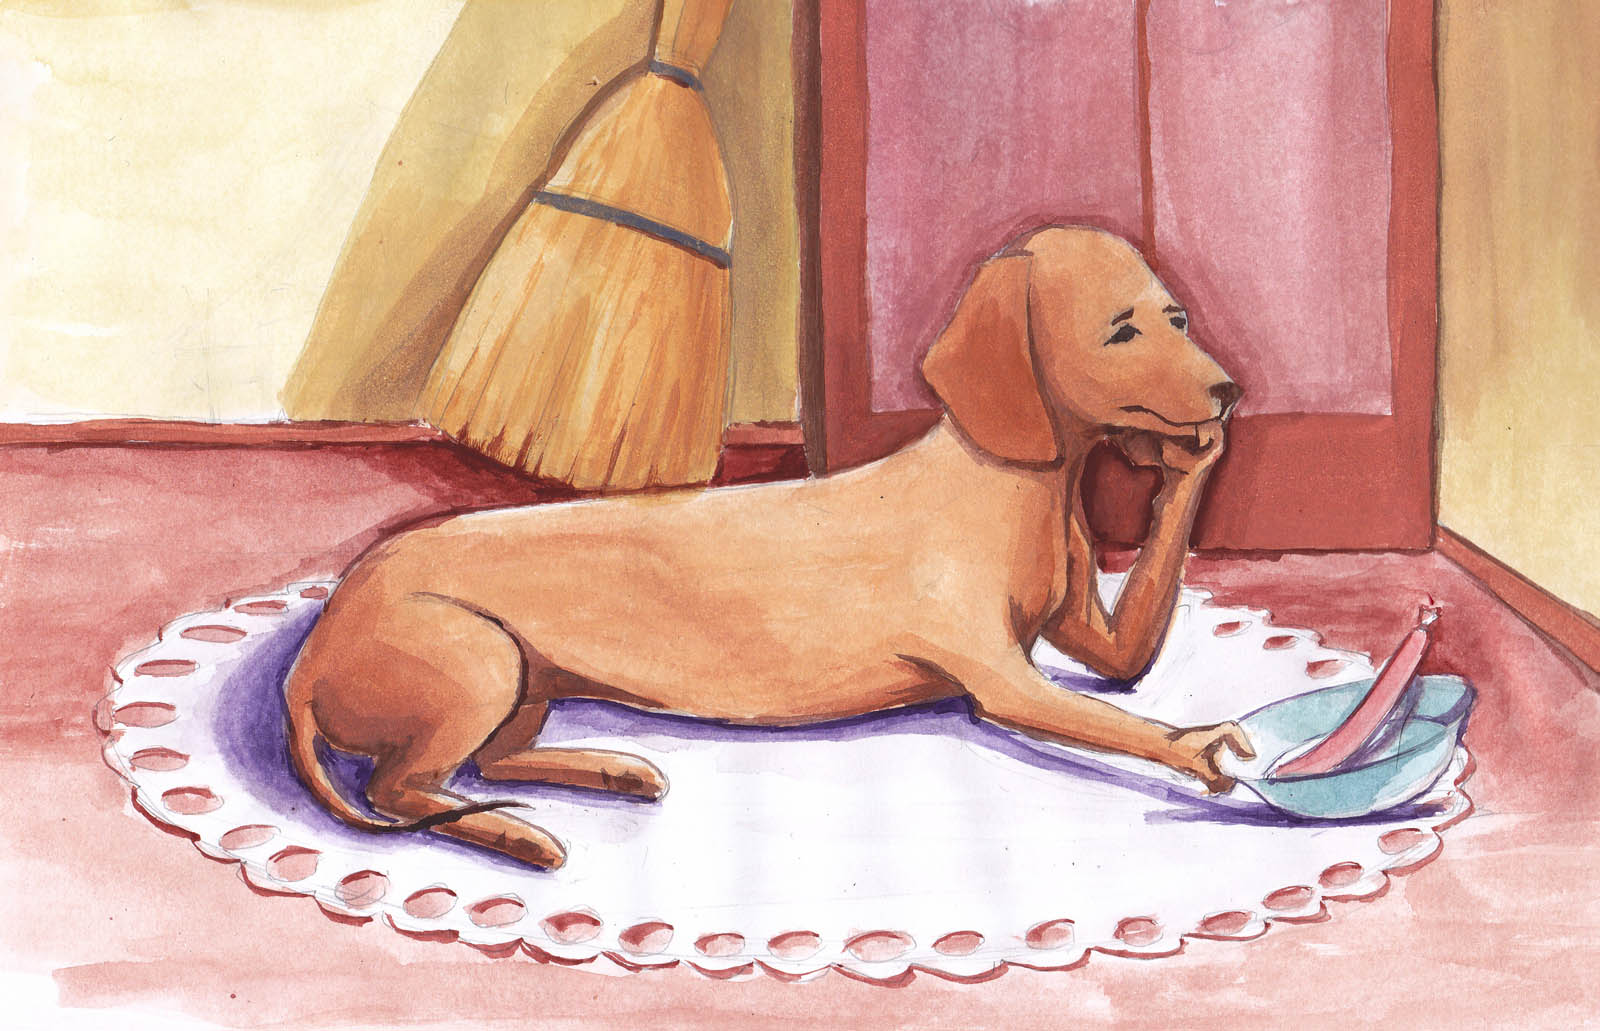 разобрал рисунки такса собака банан имеет